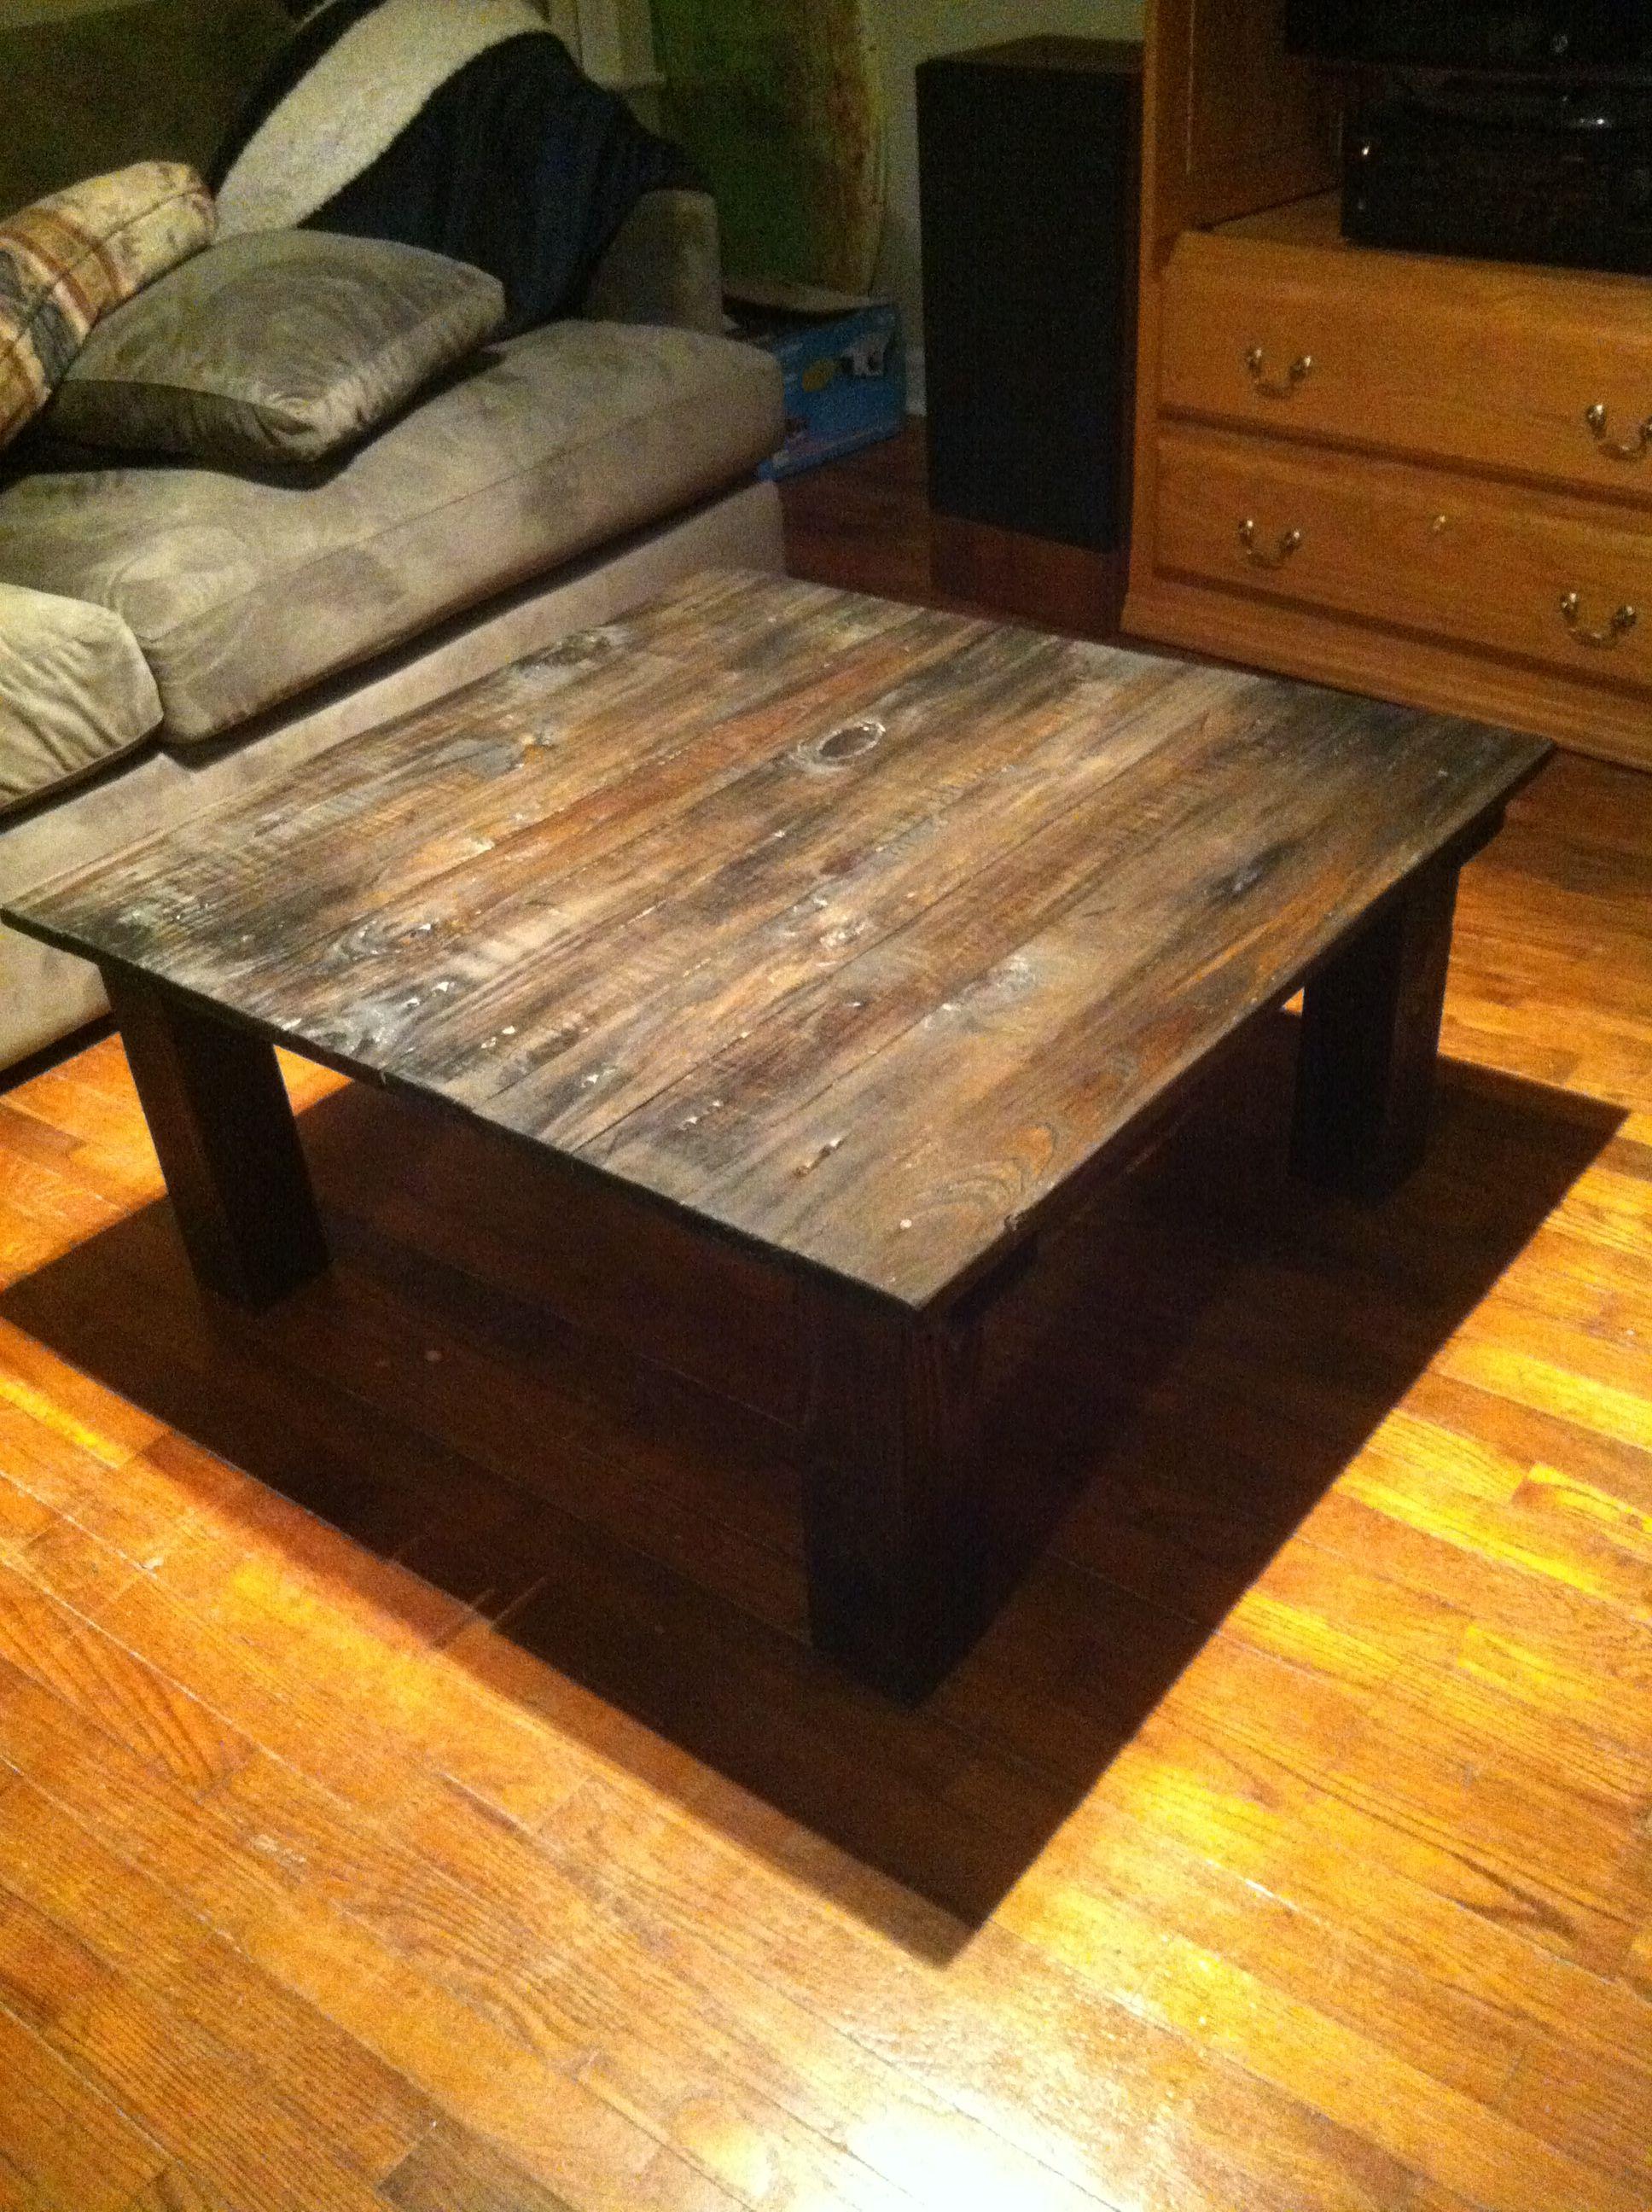 Handcrafted Wooden Coffee Table DIY   Supplies: 3 12u0027 1x4s 1 8u0027 2x4